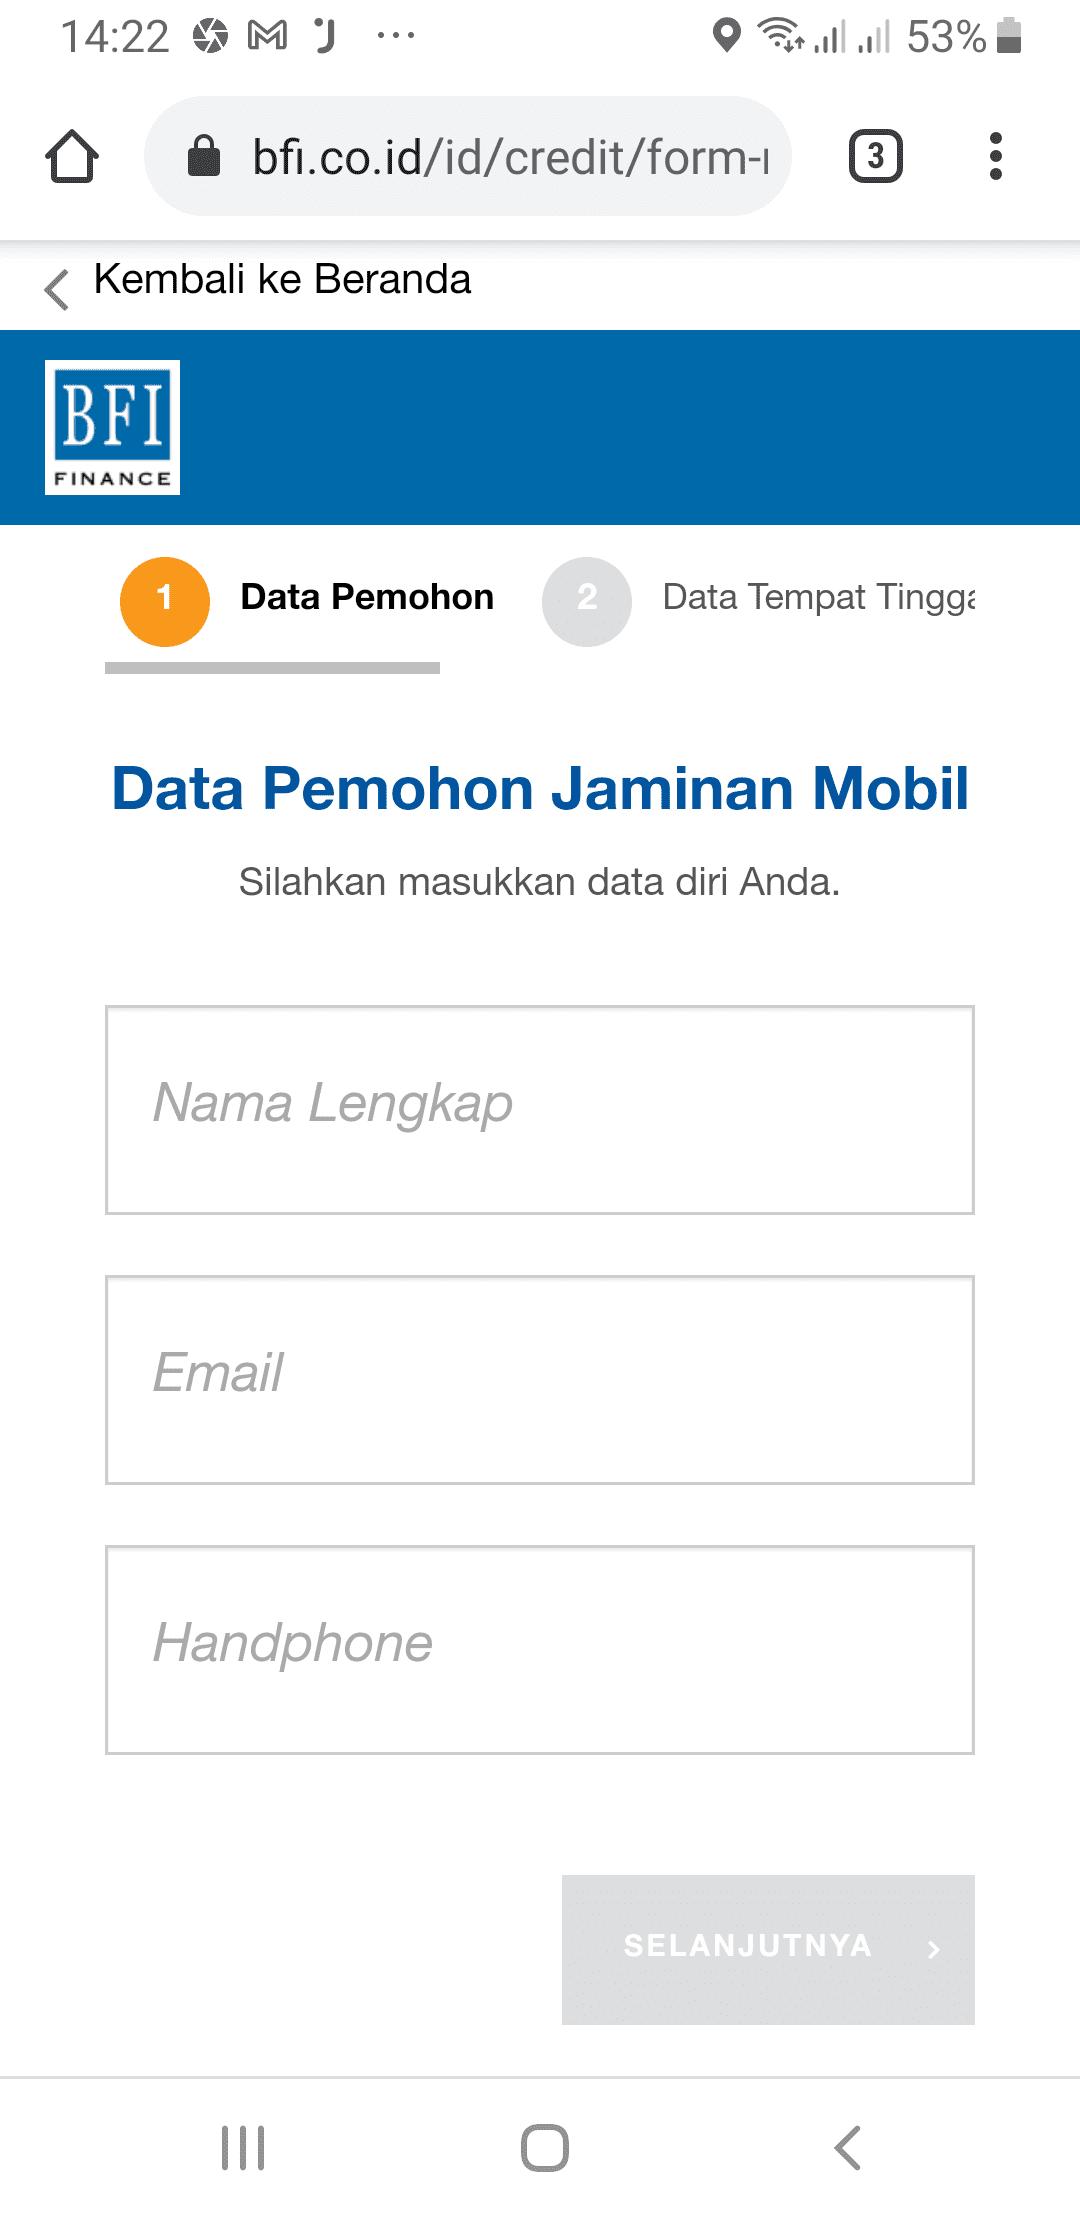 Form data BFI Finance Kredit